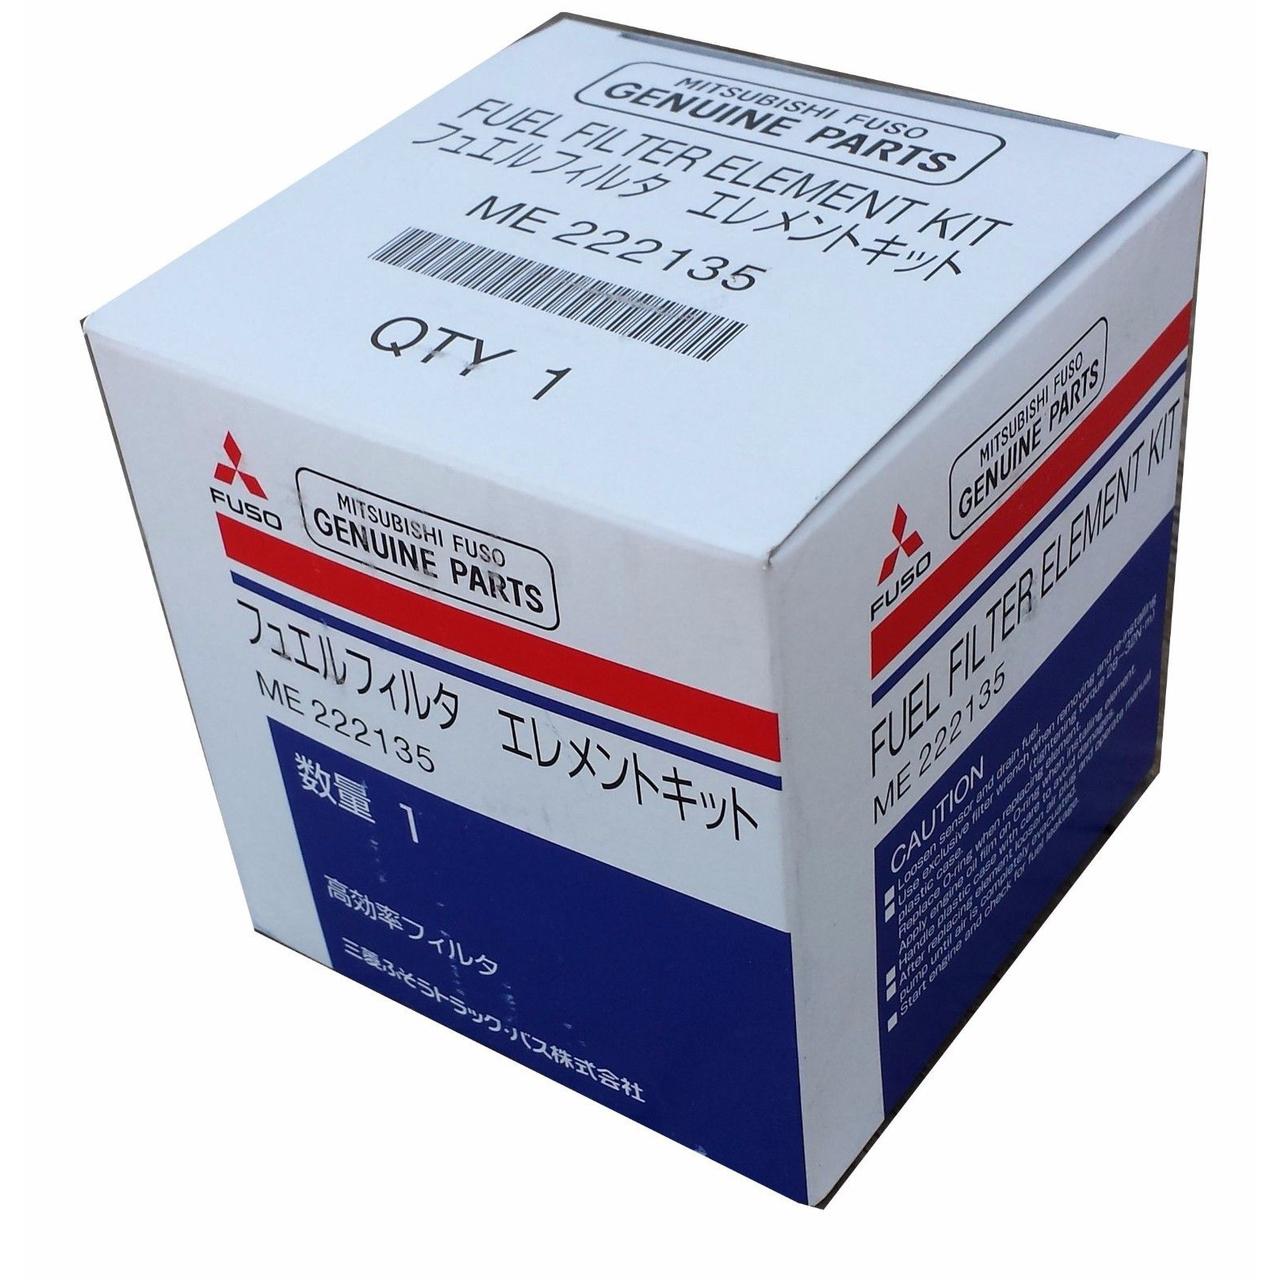 genuine mitsubishi fuso fuel filter me222135 for fuso fe fg sterling 360 [ 1280 x 1280 Pixel ]